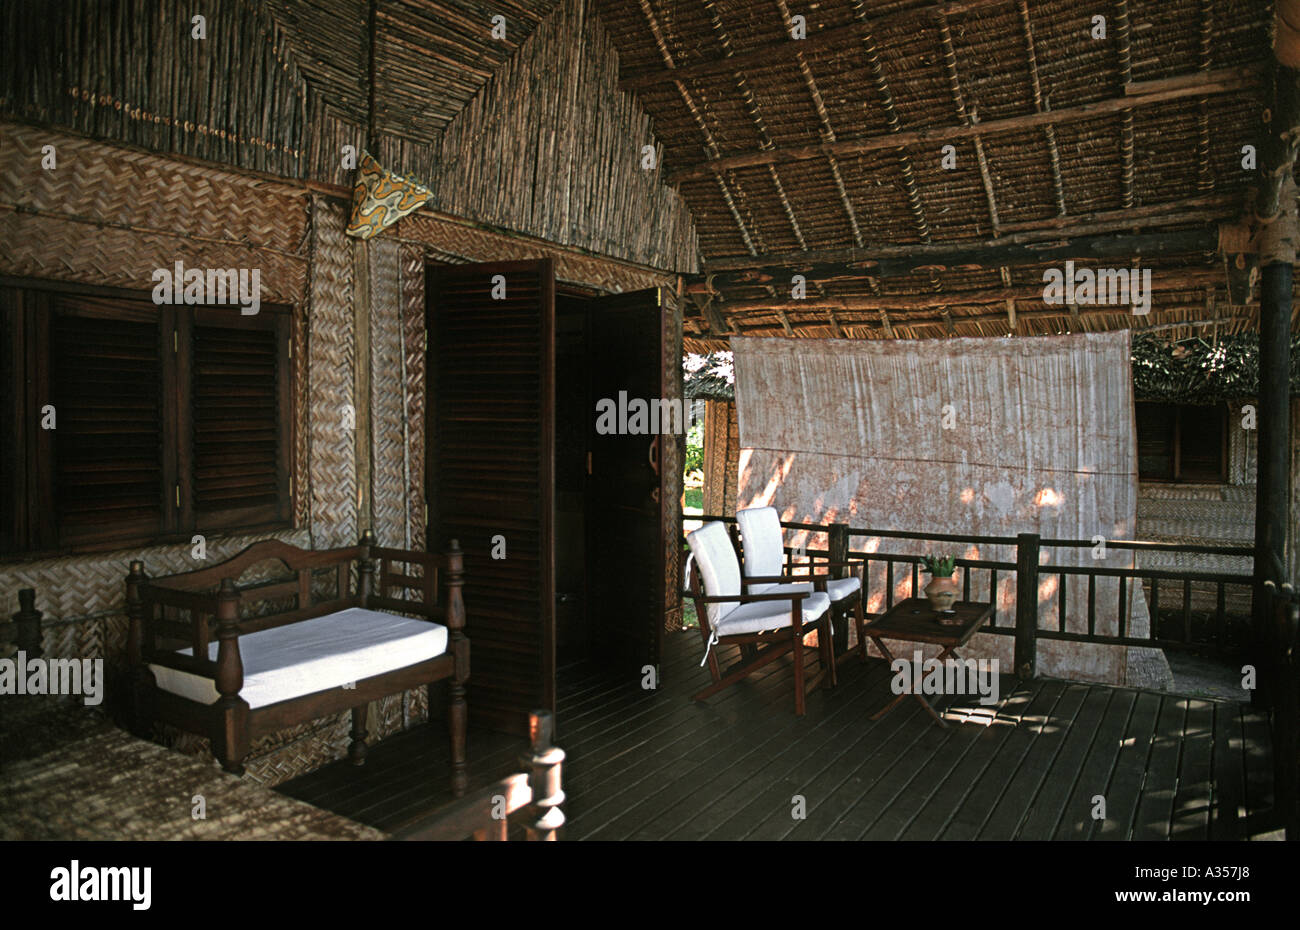 Furnished terrace of a bunglaow at the Pole Pole Lodge An eco resort at Utende on the Tanzanian island of Mafia TANZANIA - Stock Image